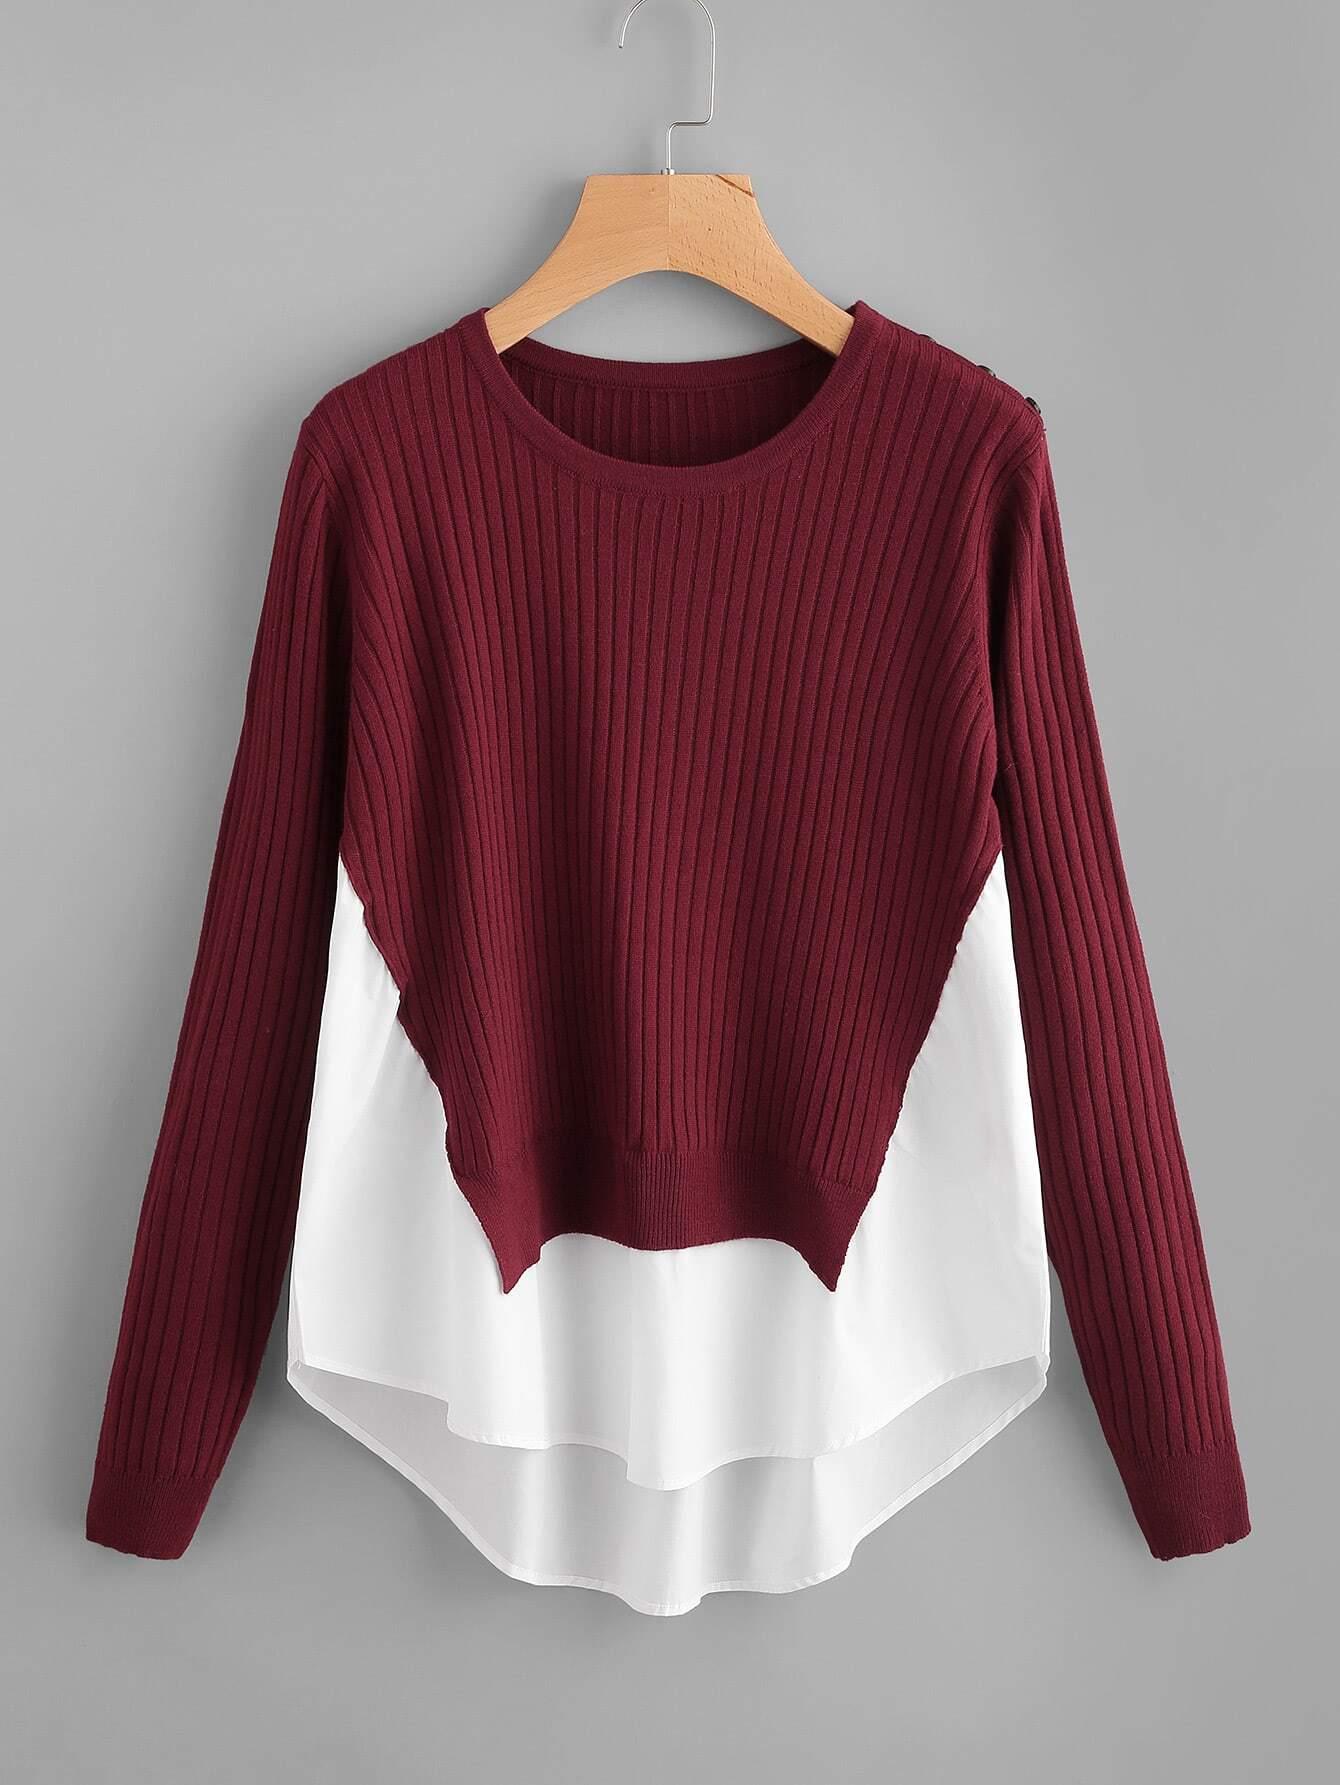 Contrast Curved Hem Ribbed Jumper sweater170818452